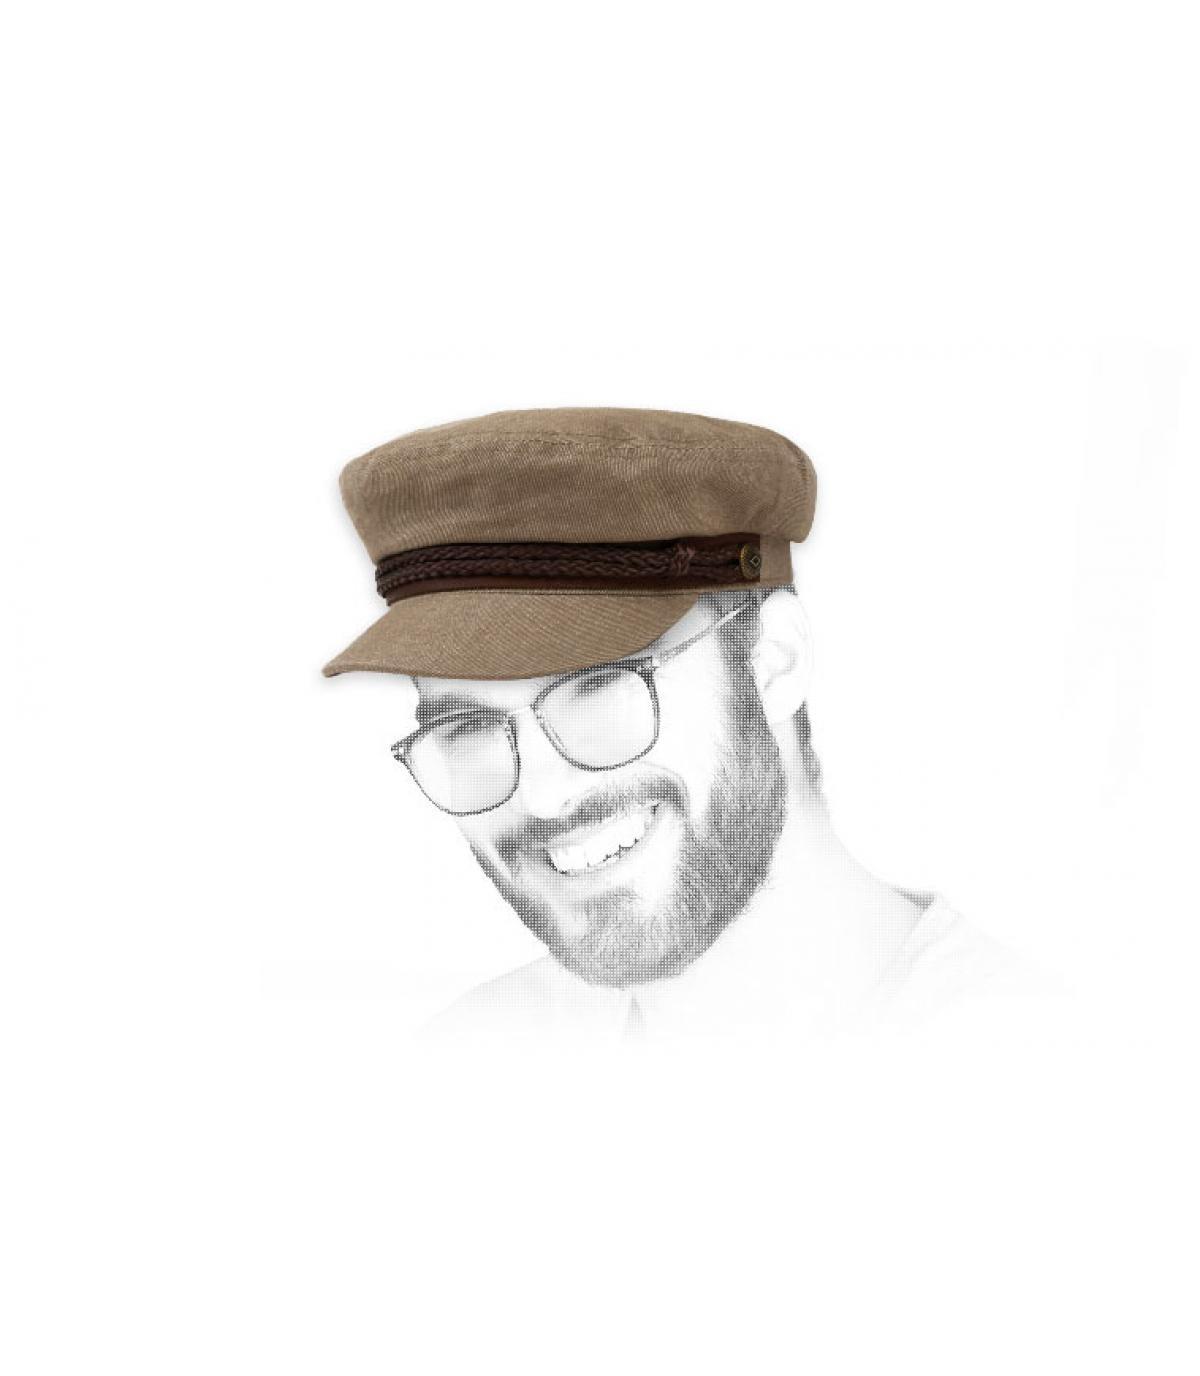 Brixton khaki fisherman cap